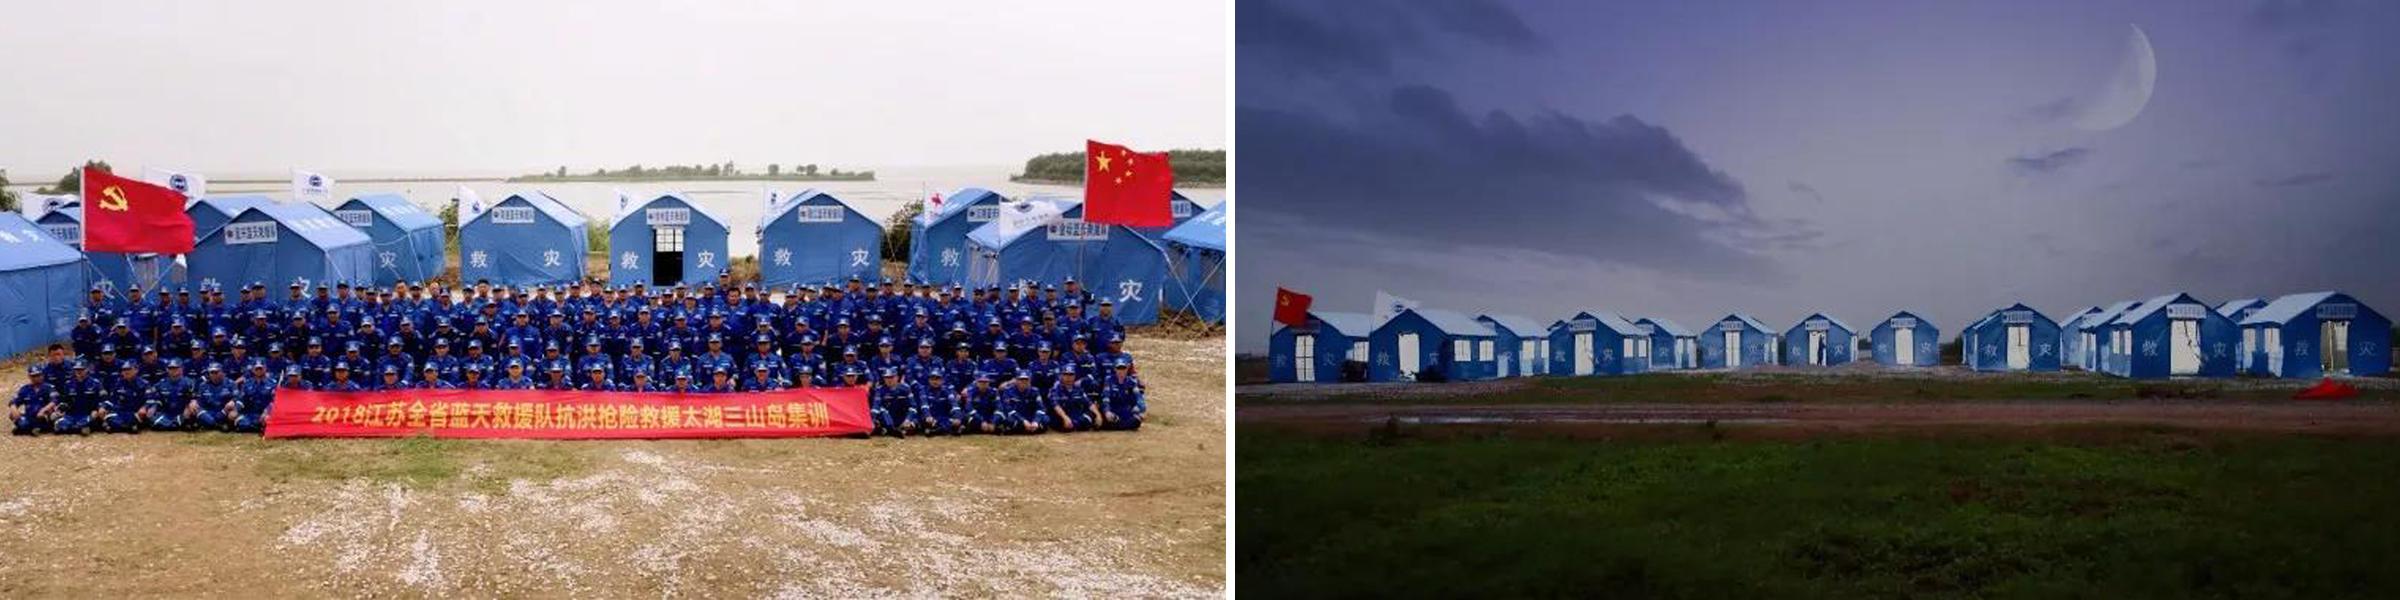 Calon Gloria Supports Jiangsu BSR Training